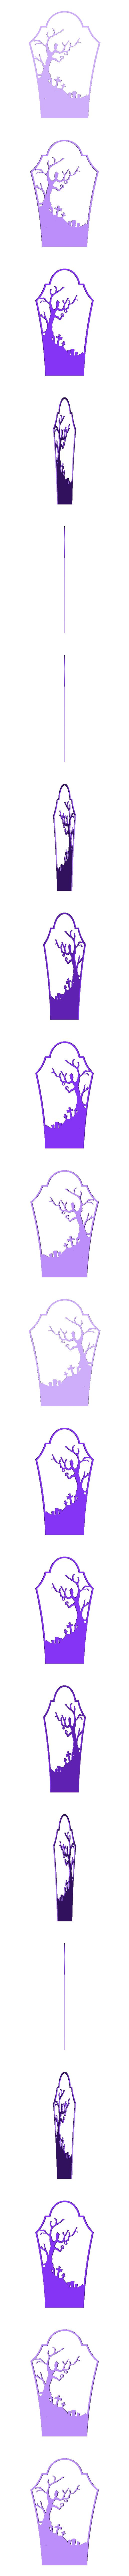 Layer_3_TREE.stl Download free STL file HALLOWEEN Depth Silhouette Gravestone • Model to 3D print, Grafit